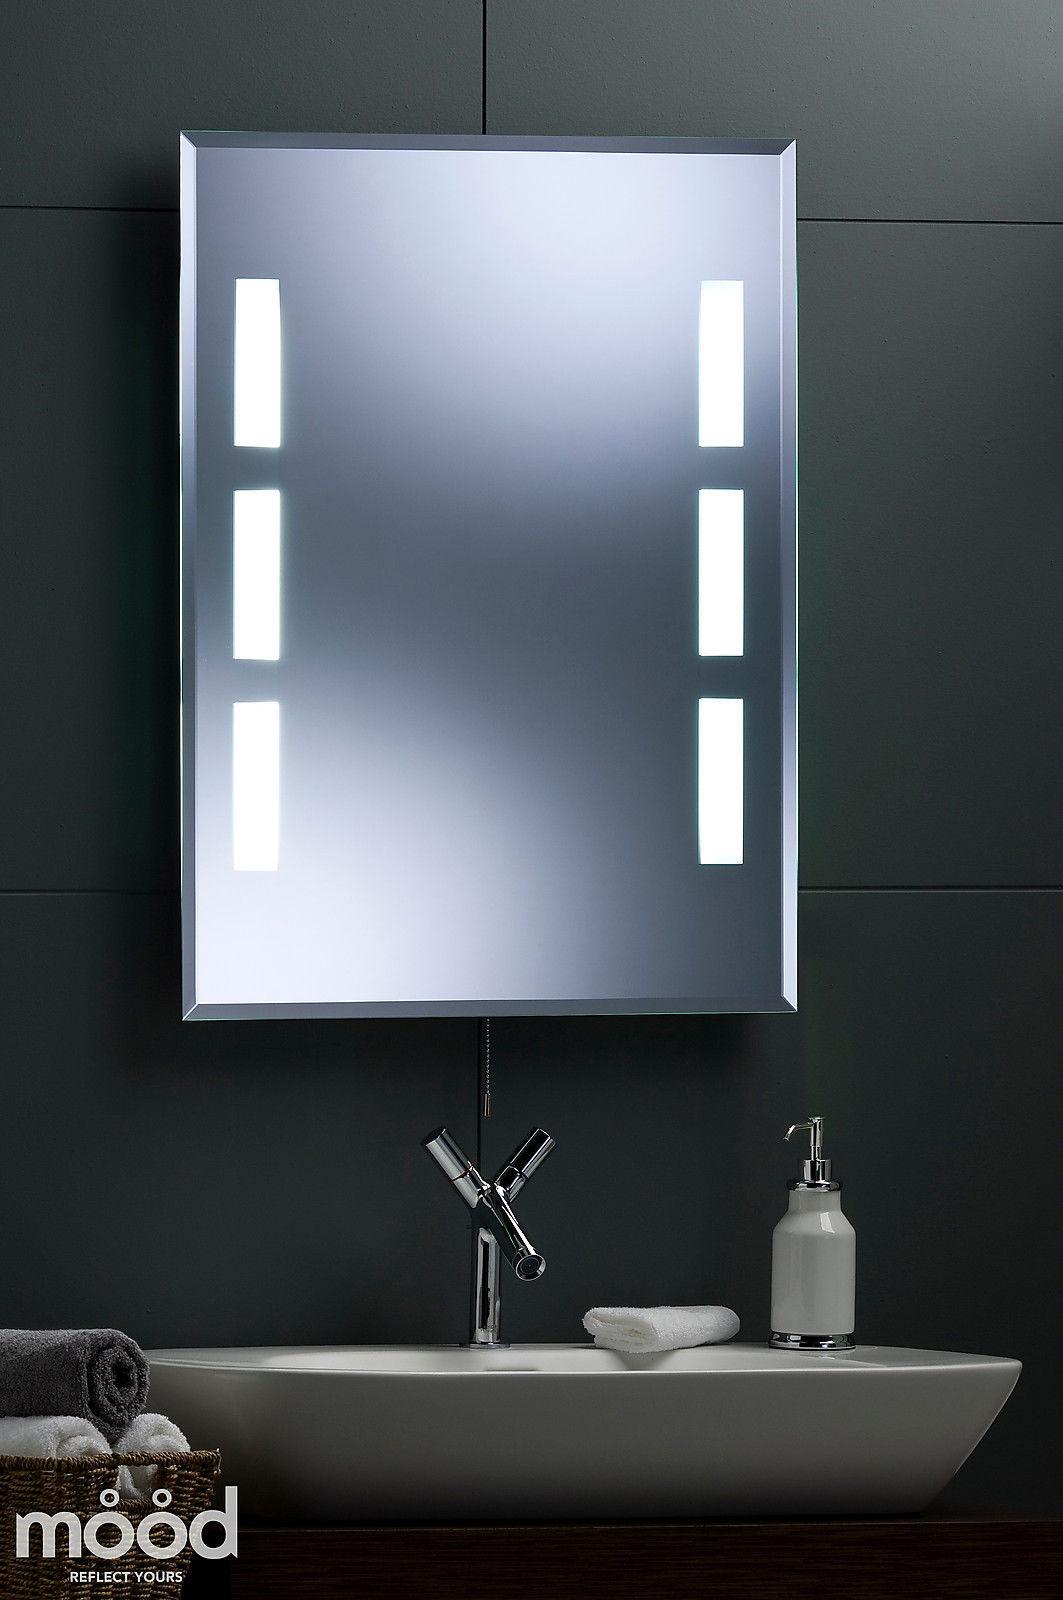 modern bathroom wall mirror illuminated fluorescent back lit 80x60 cm ebay. Black Bedroom Furniture Sets. Home Design Ideas